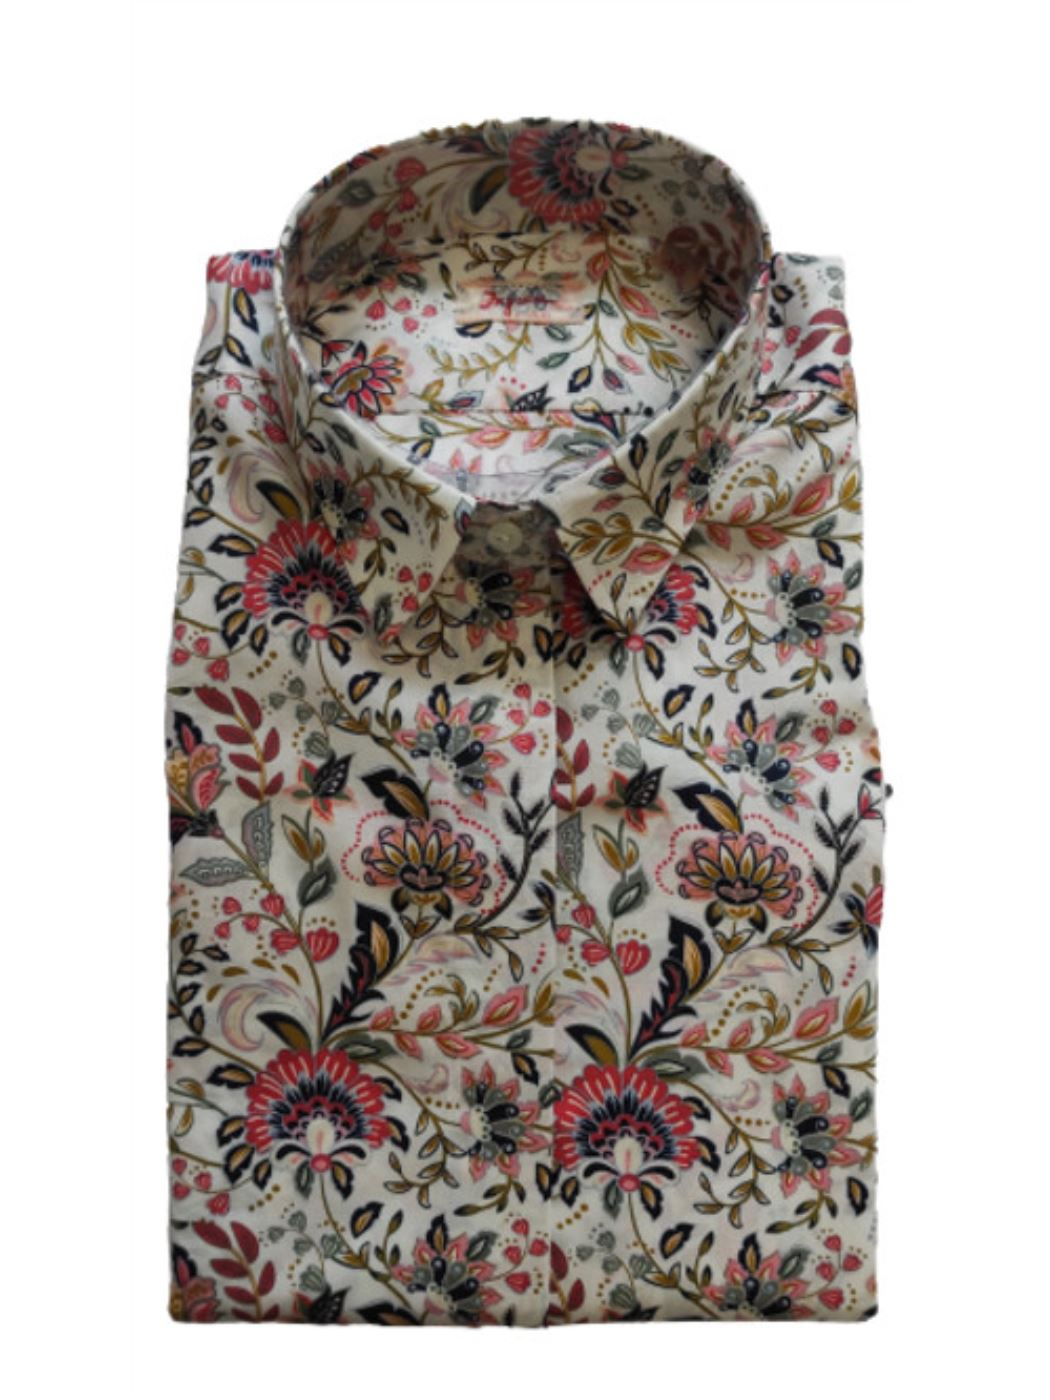 Camicia Donna Manica Lunga Fantasia IS5H061